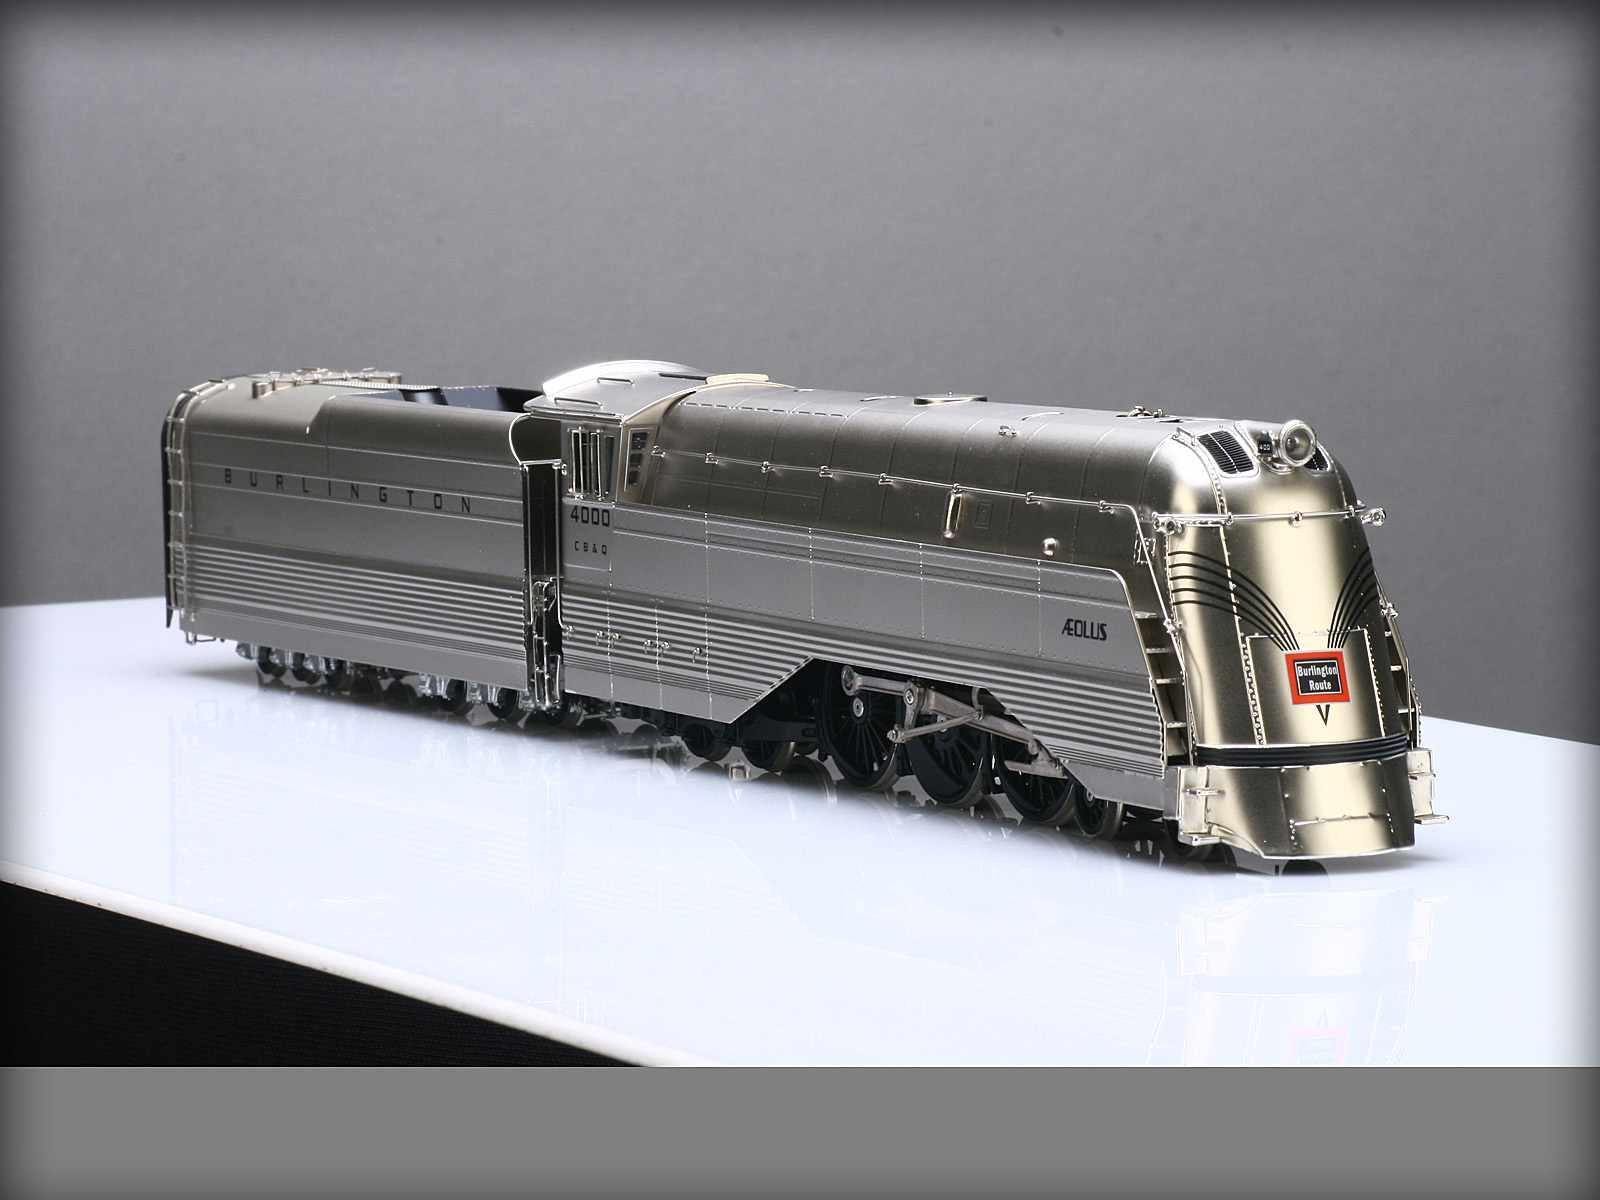 PSC 17586-1 - S-4a, CHICAGO, BURLINGTON & QUINCY, streamlined. 'AEOLUS'.05